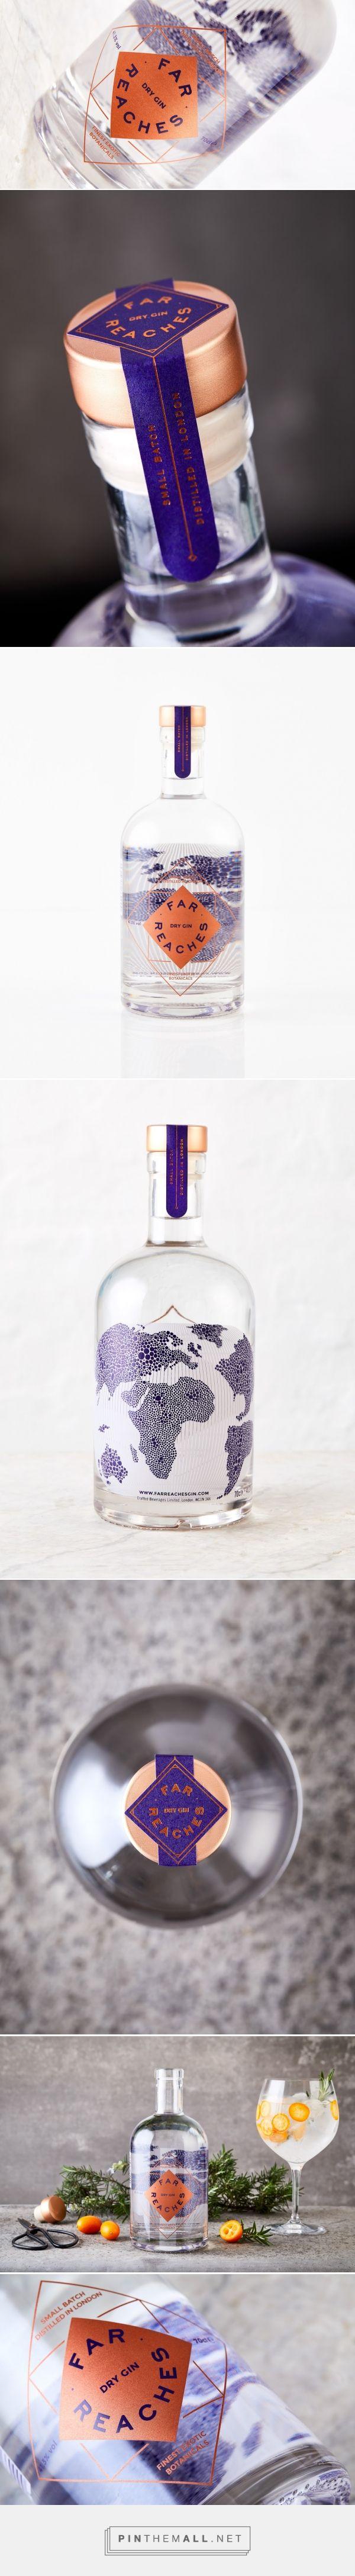 Far Reaches Gin packaging design by Chris Moore Design - http://www.packagingoftheworld.com/2017/11/far-reaches-gin.html